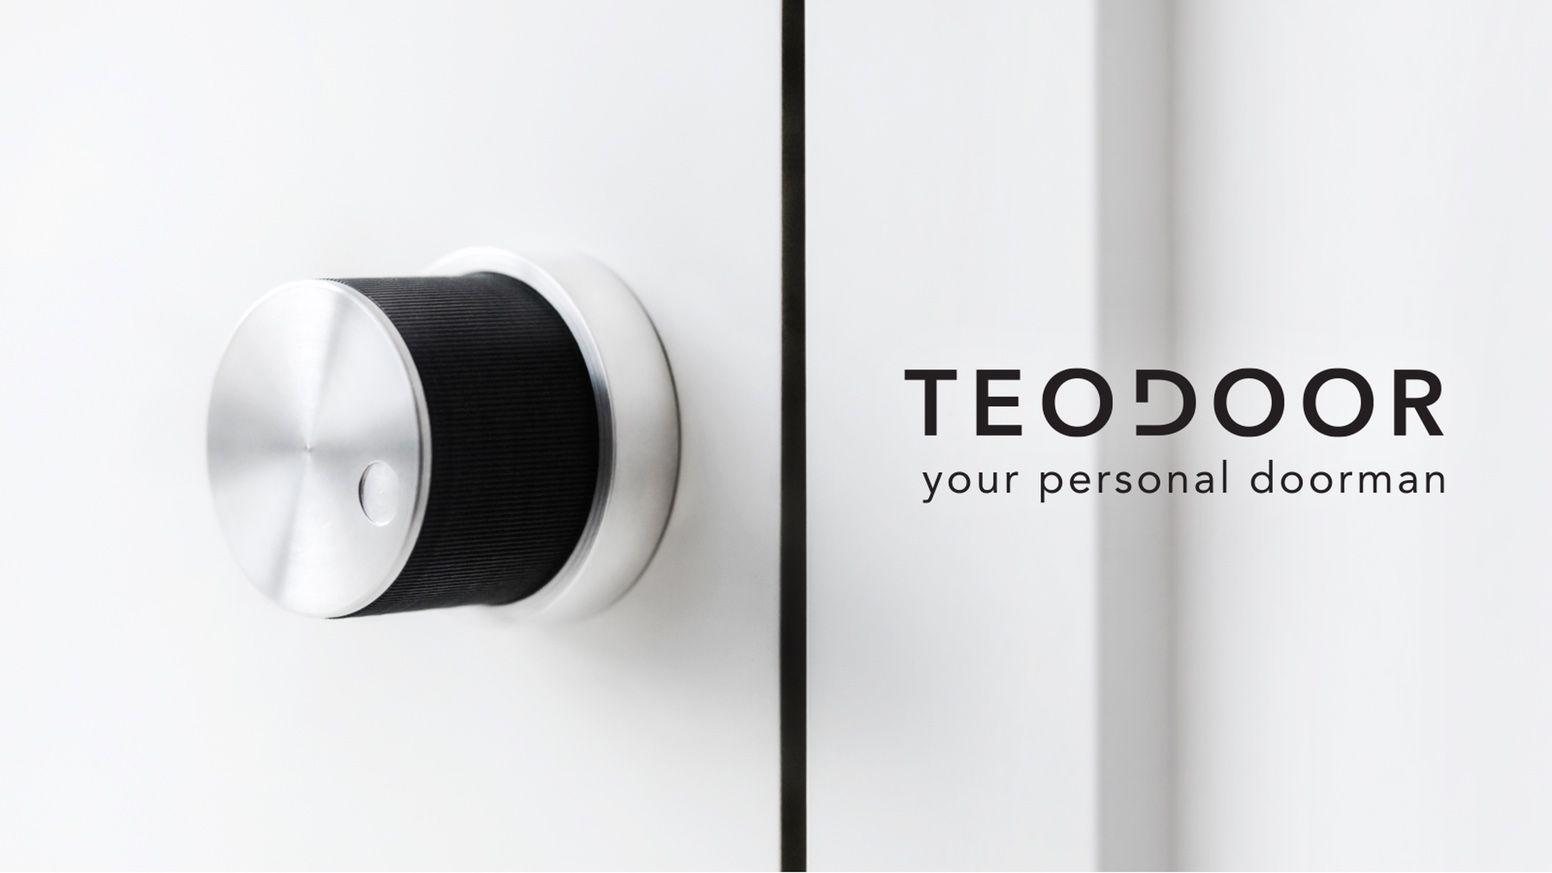 Teodoor - Smart Lock by Martin K u2014 #Kickstarter & Teodoor - Smart Lock by Martin K u2014 #Kickstarter   Products I Want ...